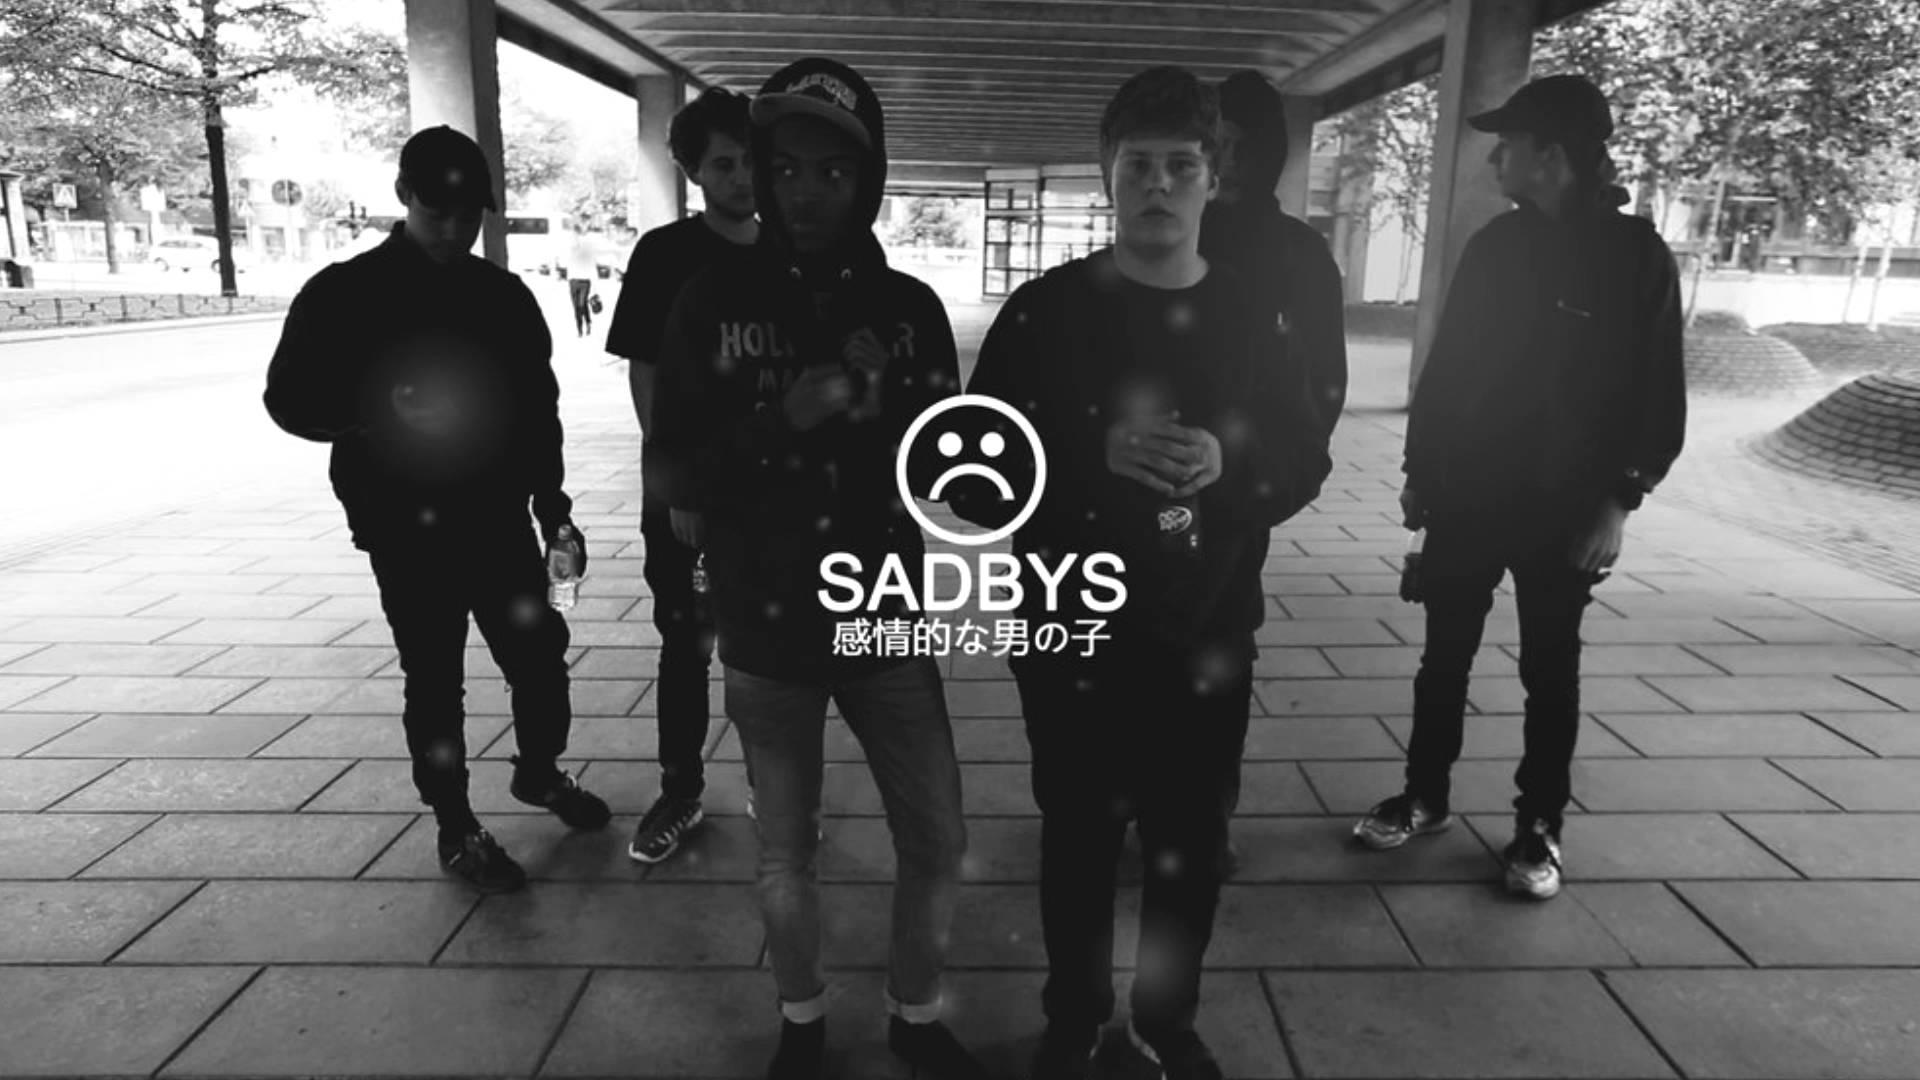 【Chill Trap】Cyber Posix - SADBOYS2001 ft. Arceos